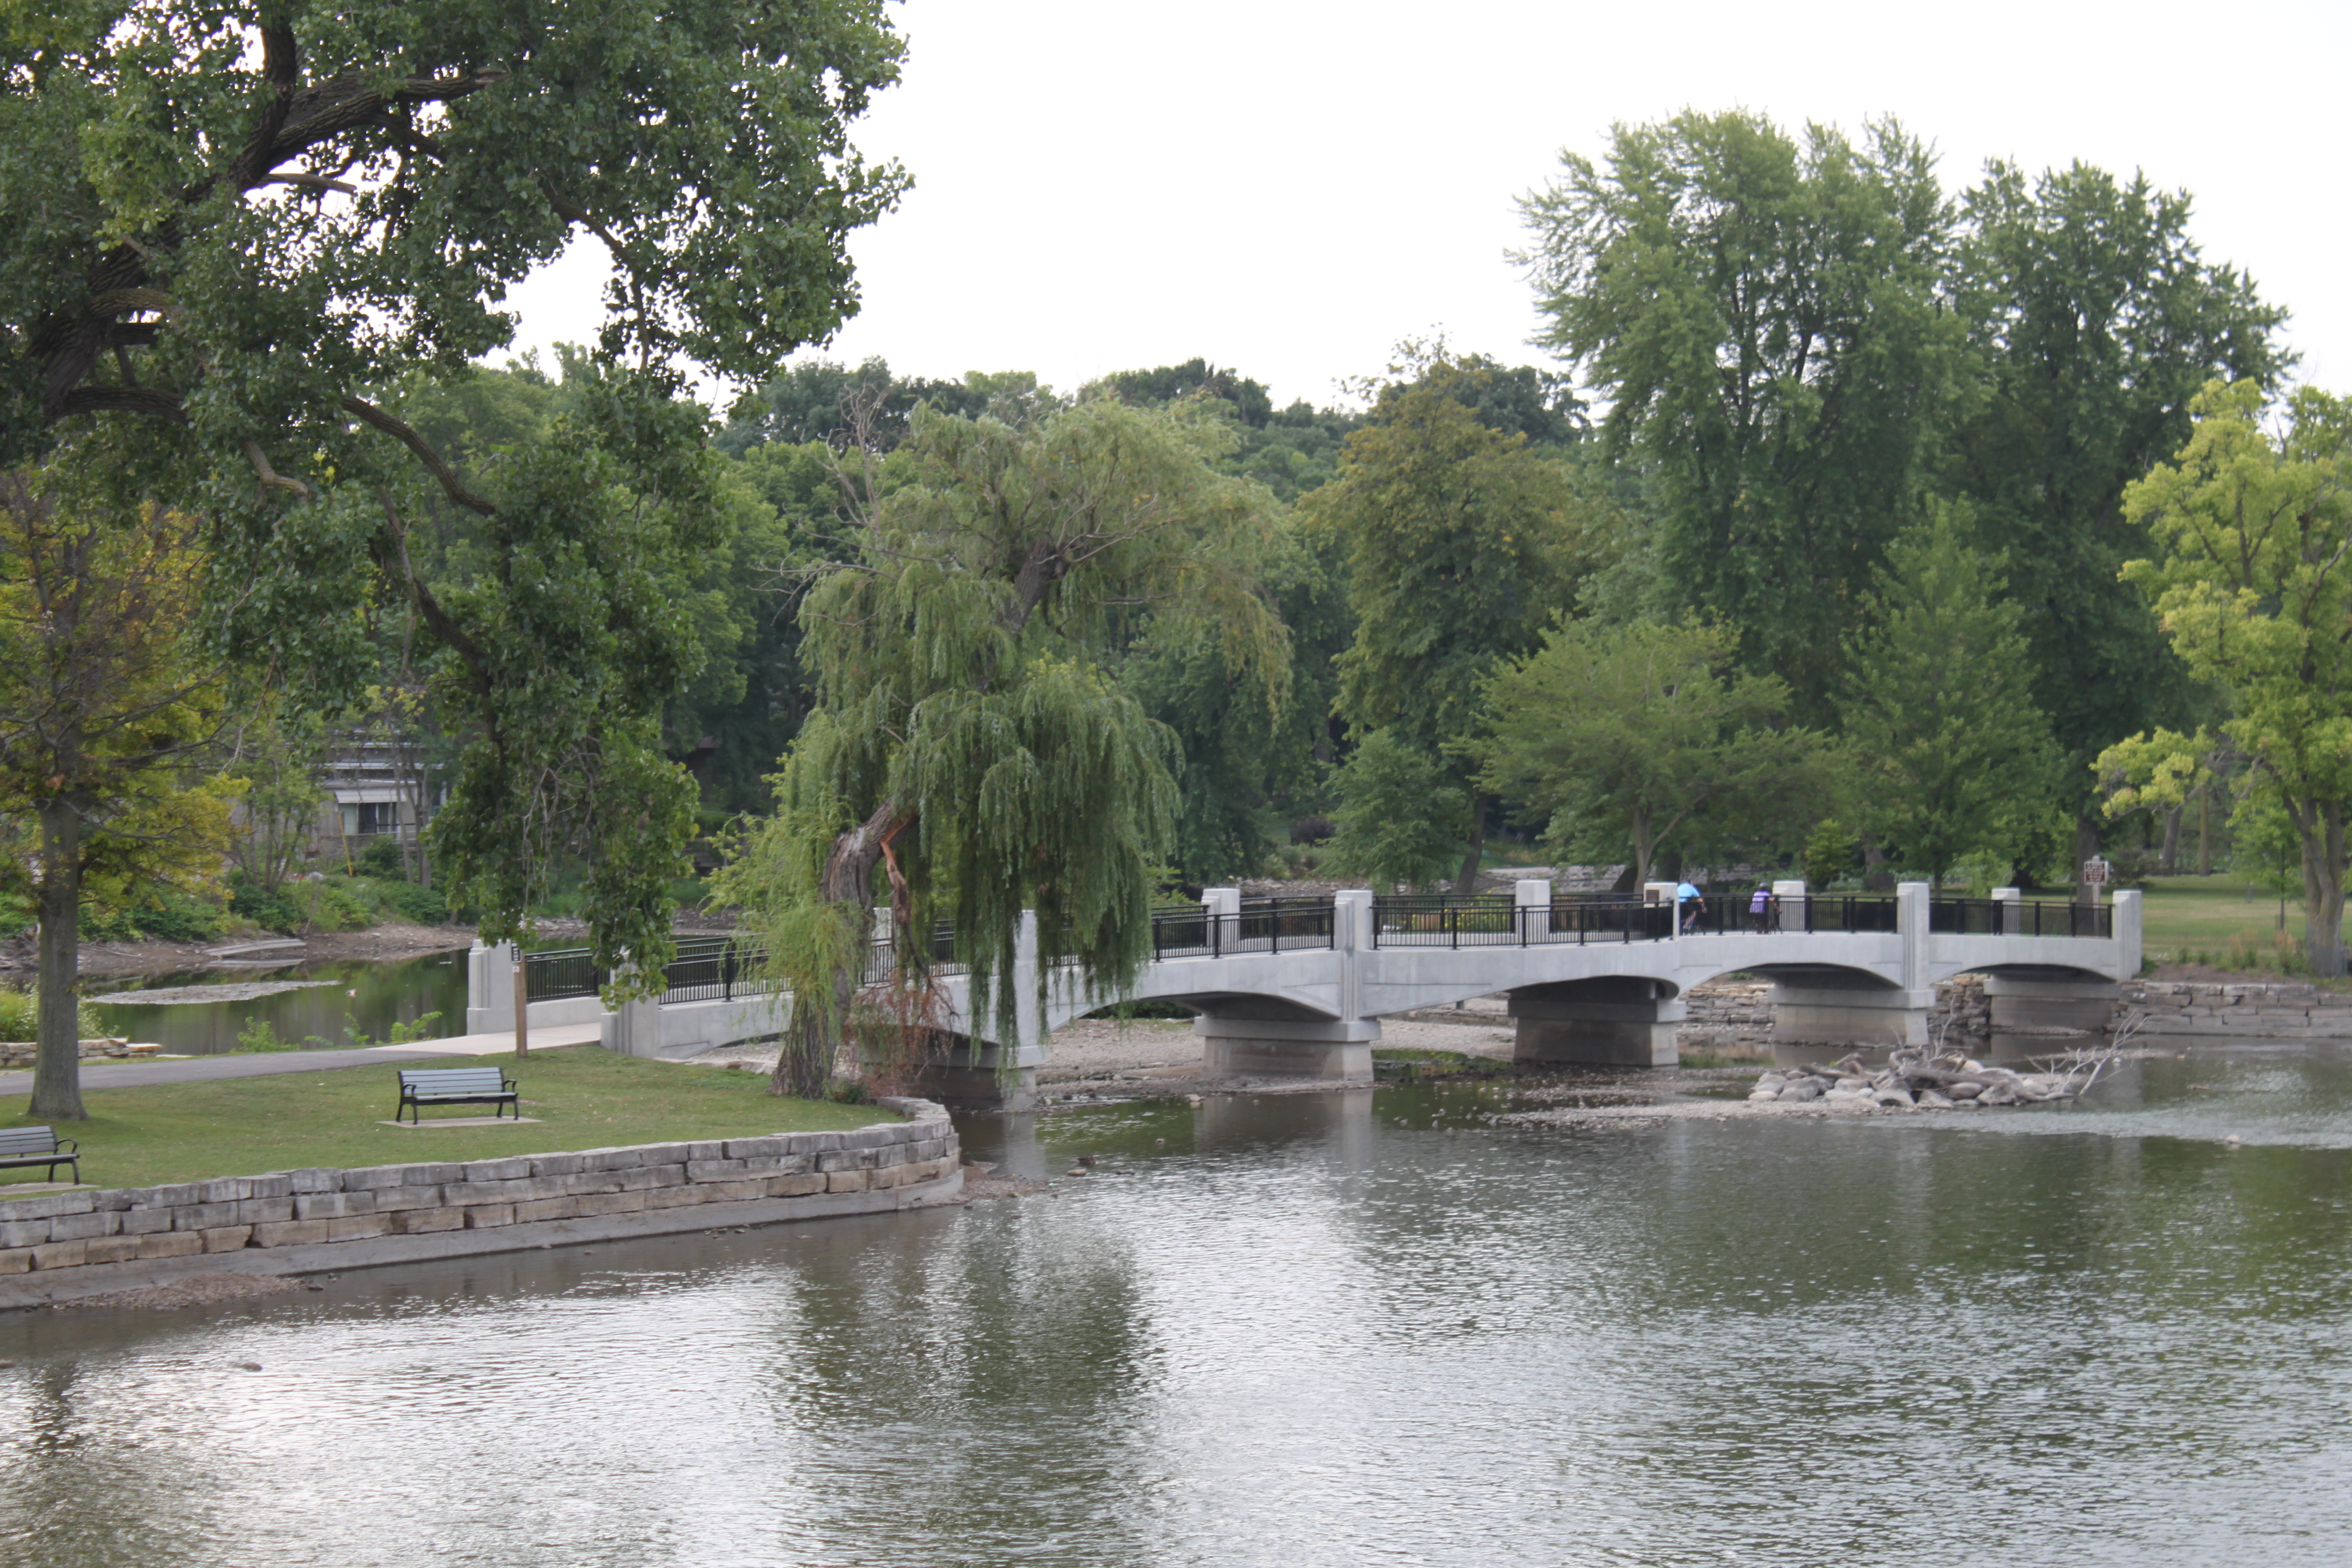 Island Park Geneva